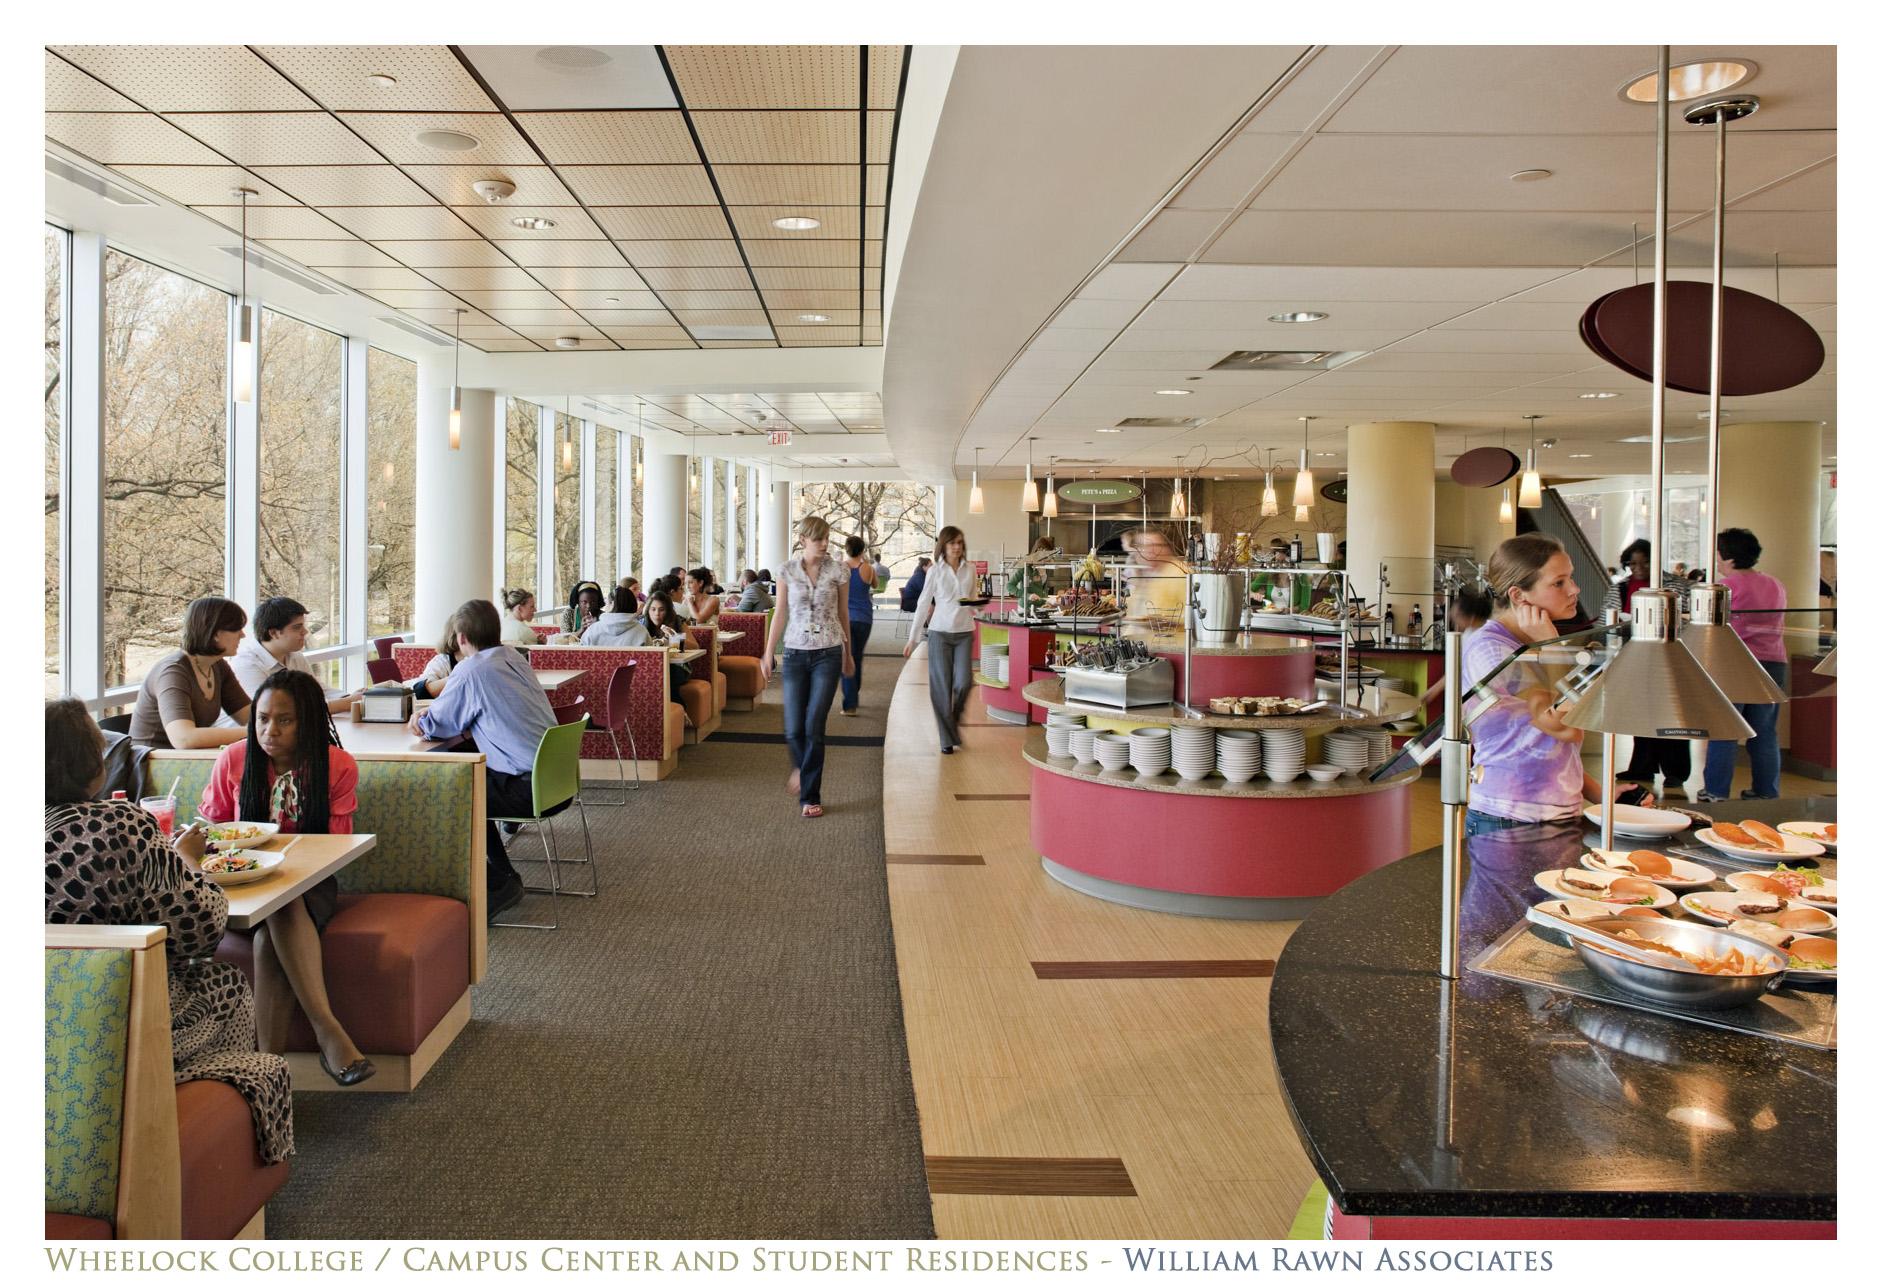 049_Robert-Benson-Photography-William-Rawn_Associates-Wheelock-Campus-Center-Student-Residencies-23.JPG